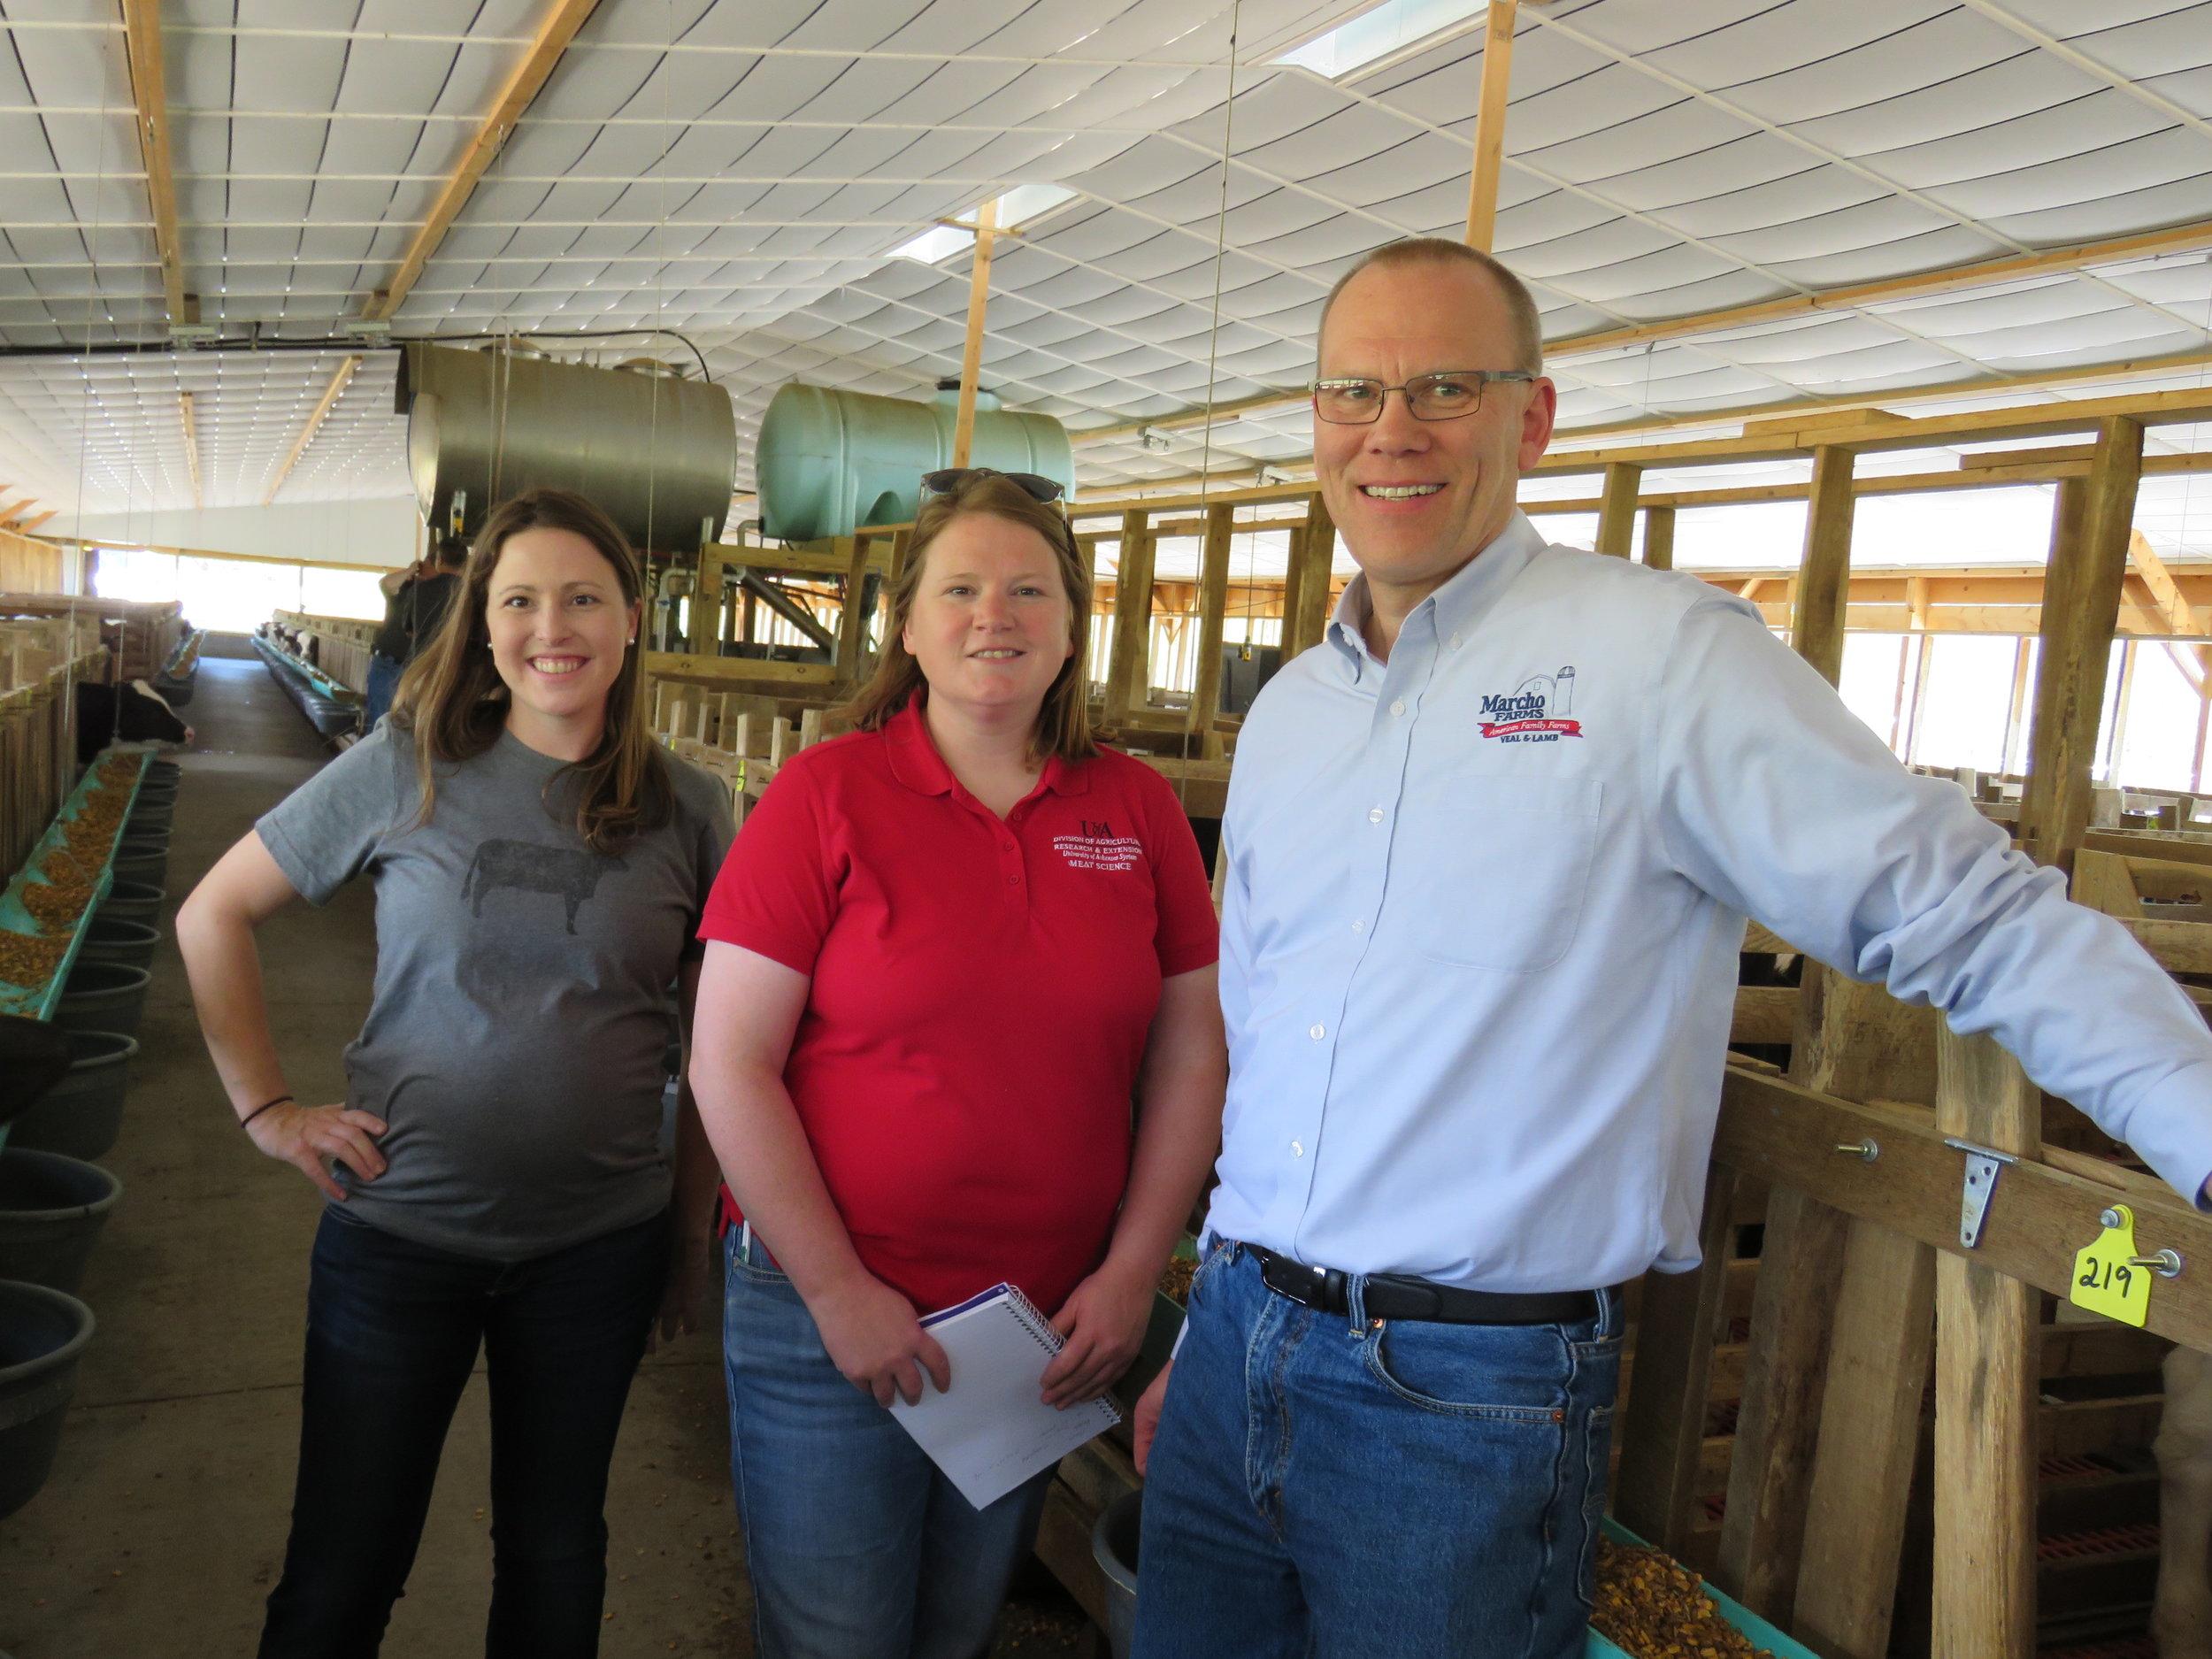 Krista Stauffer, The Farmer's Wifee, Janeal Yancey, PhD, University of Arkansas, Dale Bakke, President of the American Veal Association